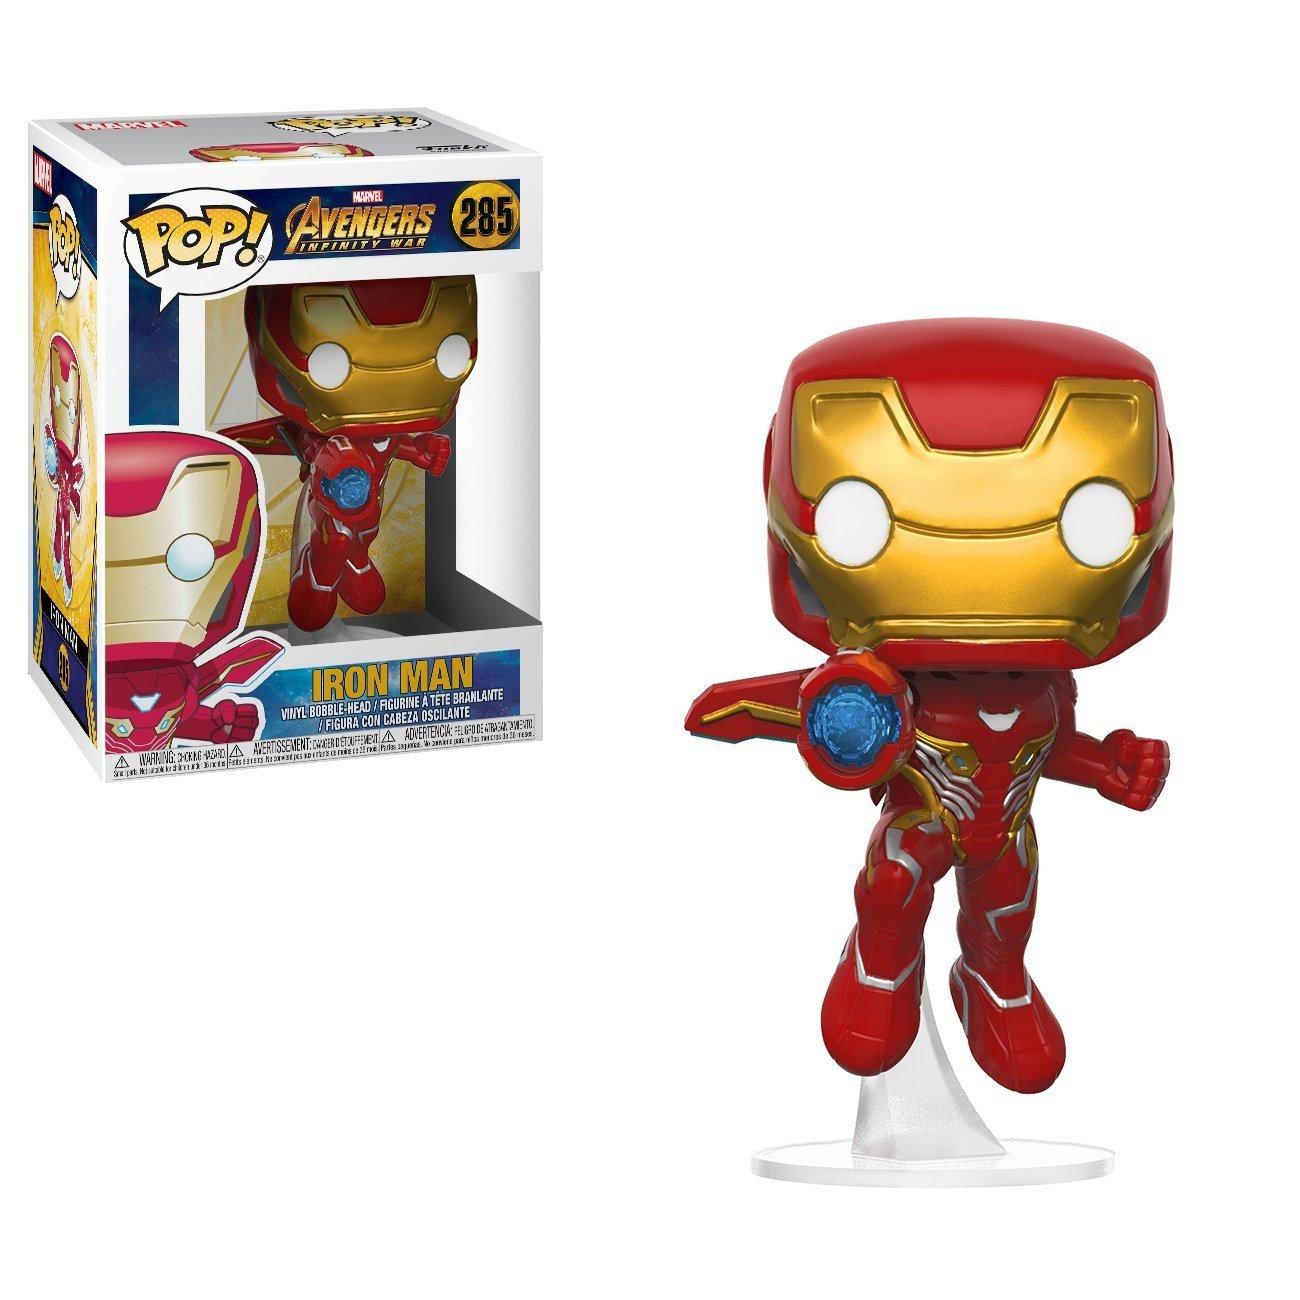 Funko POP! Marvel: Avengers Infinity War - Iron Man imagen